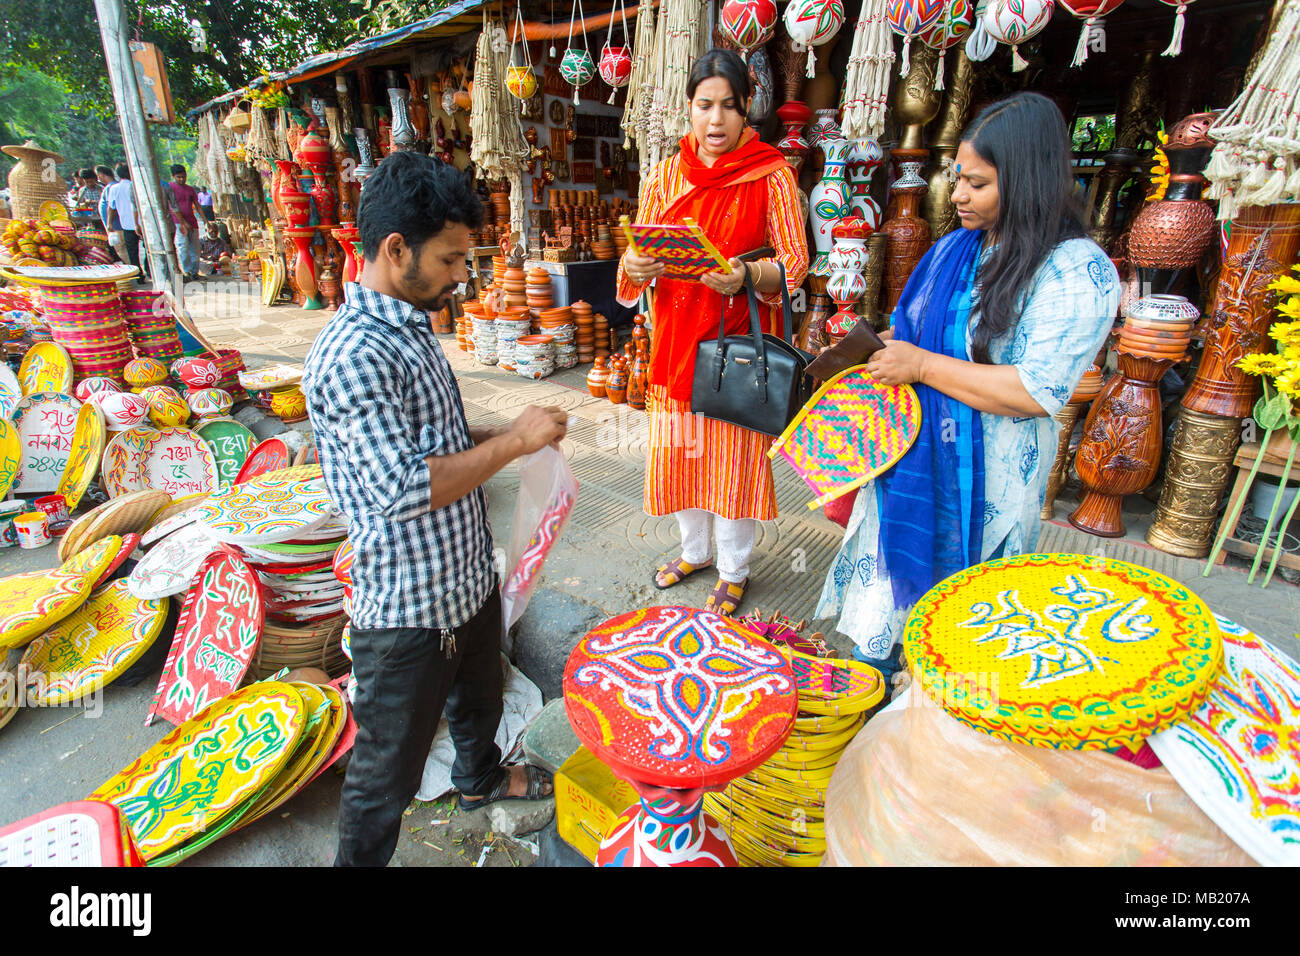 Dhaka, Bangladesh  5th Apr, 2018  Dhaka University Fine Arts